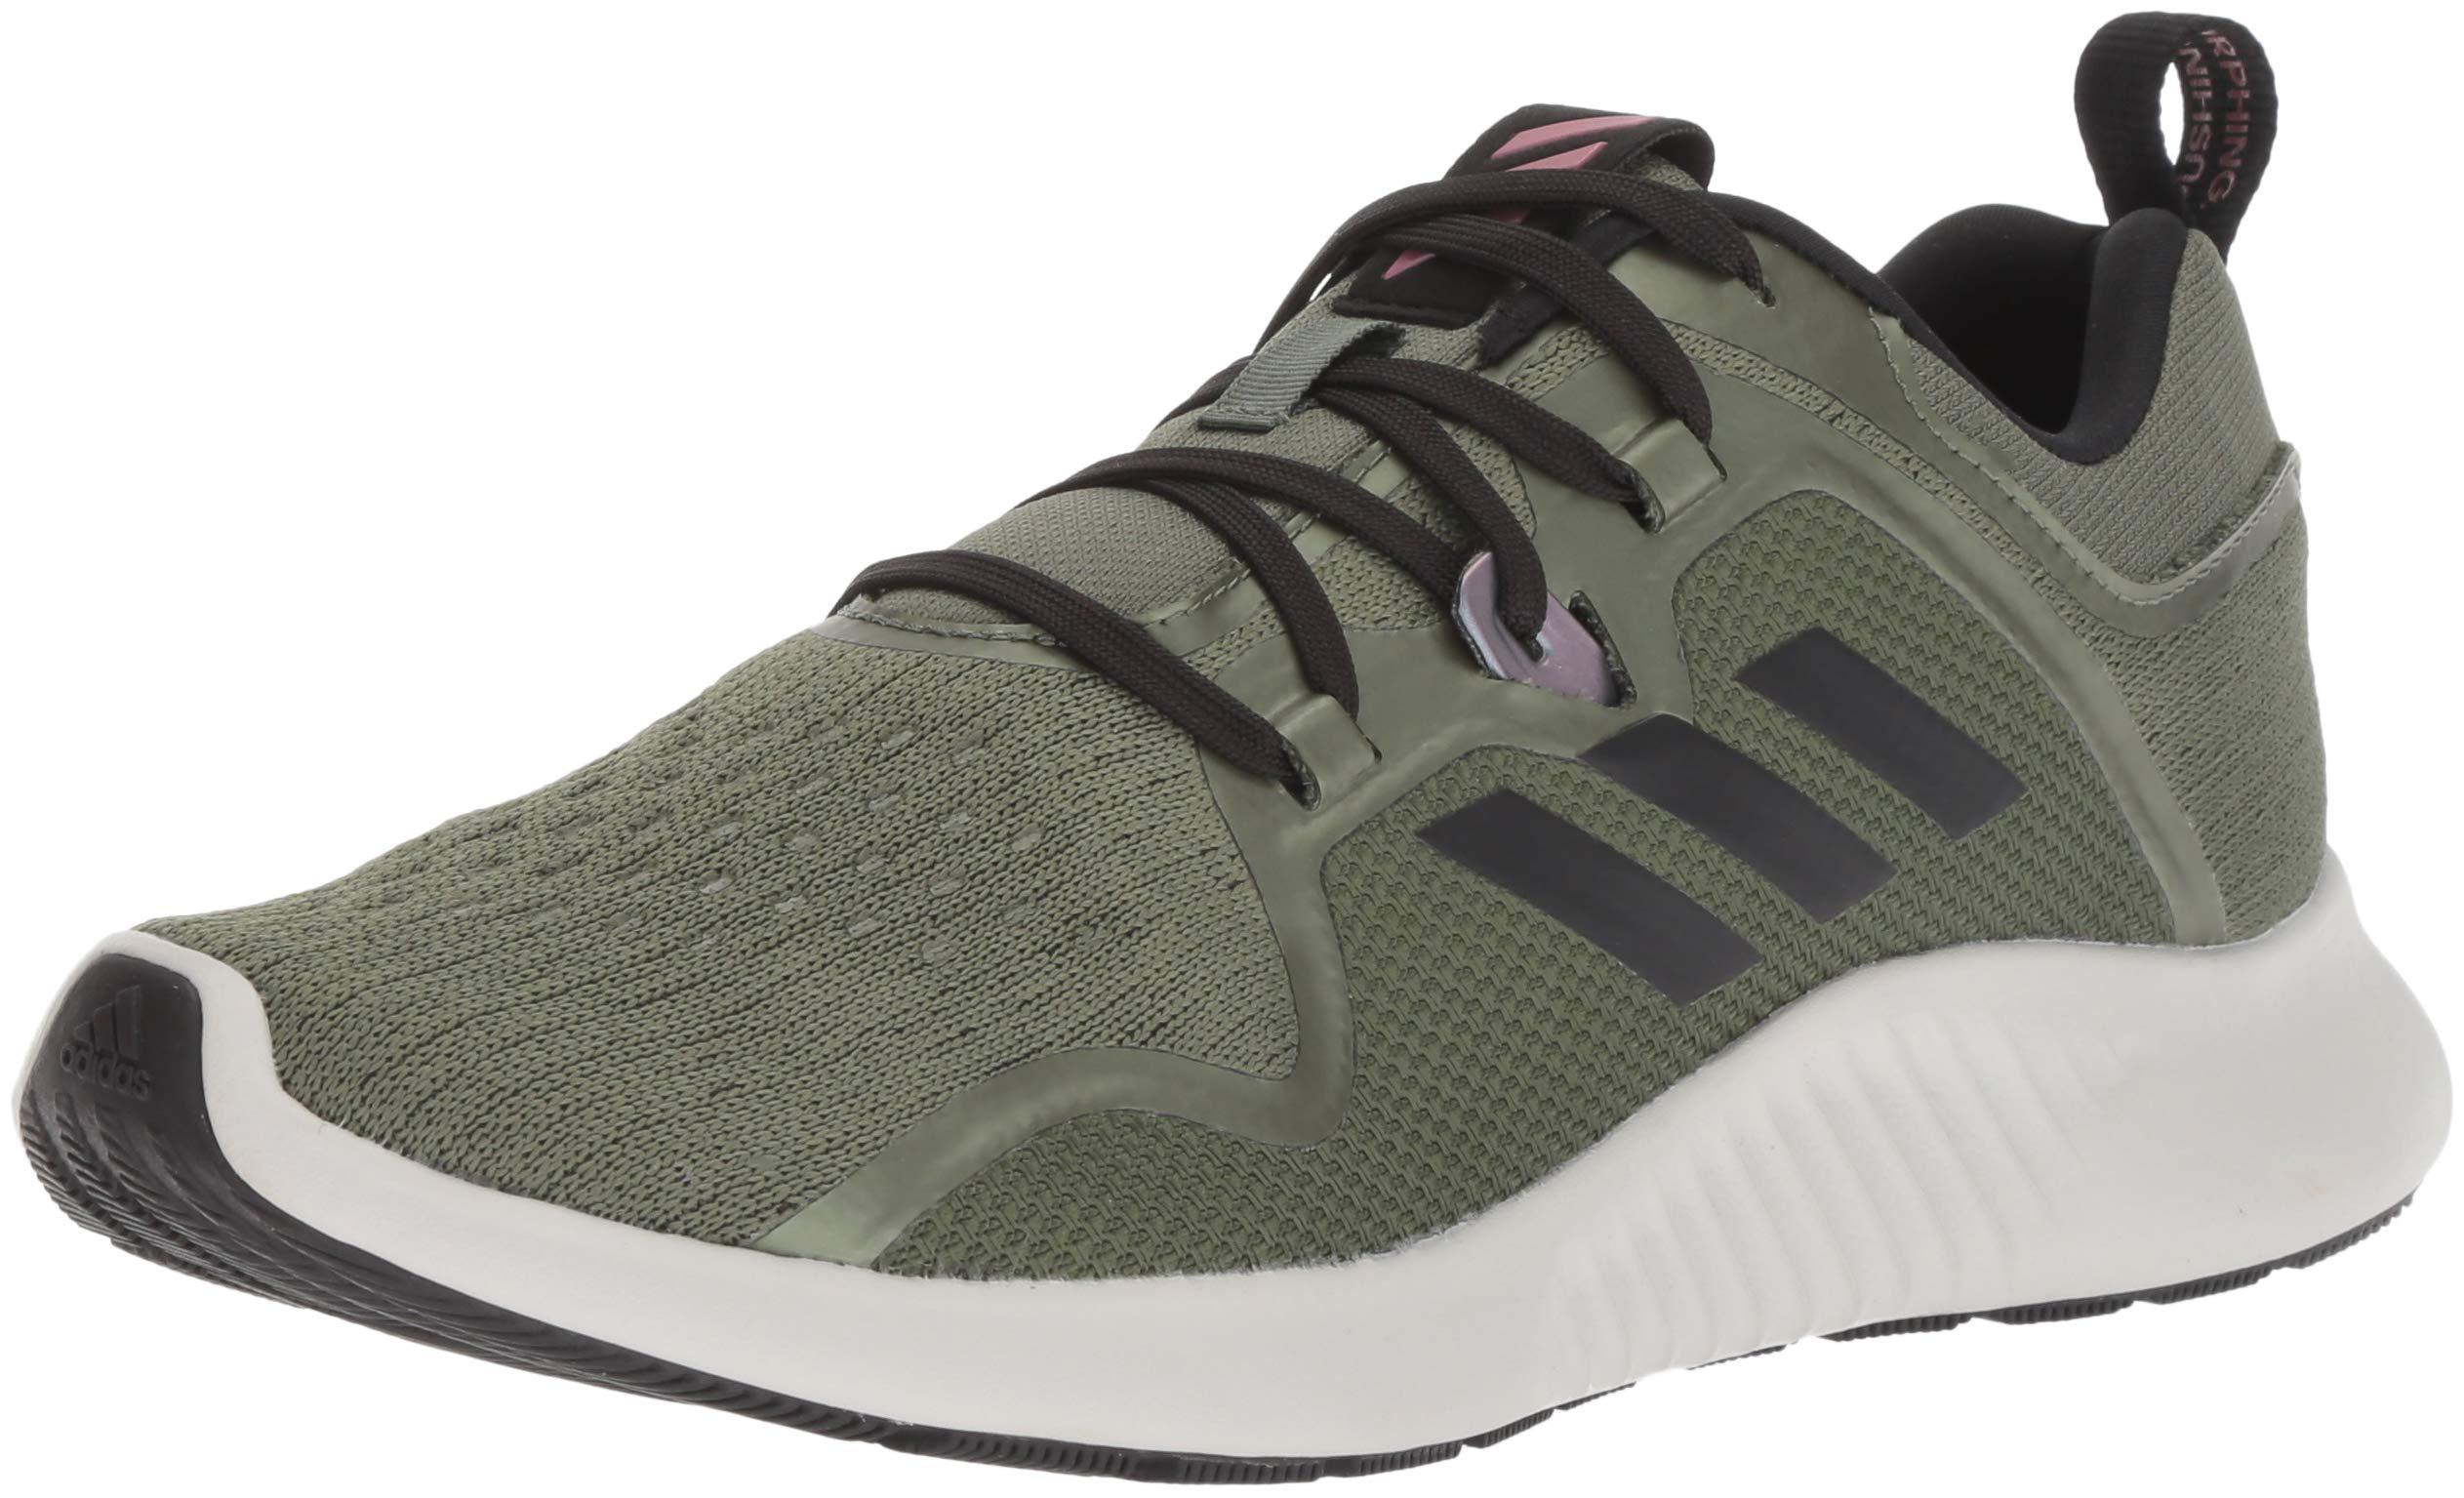 adidas Women's EdgeBounce Running Shoe Base Green/Black/Trace Maroon 5 M US